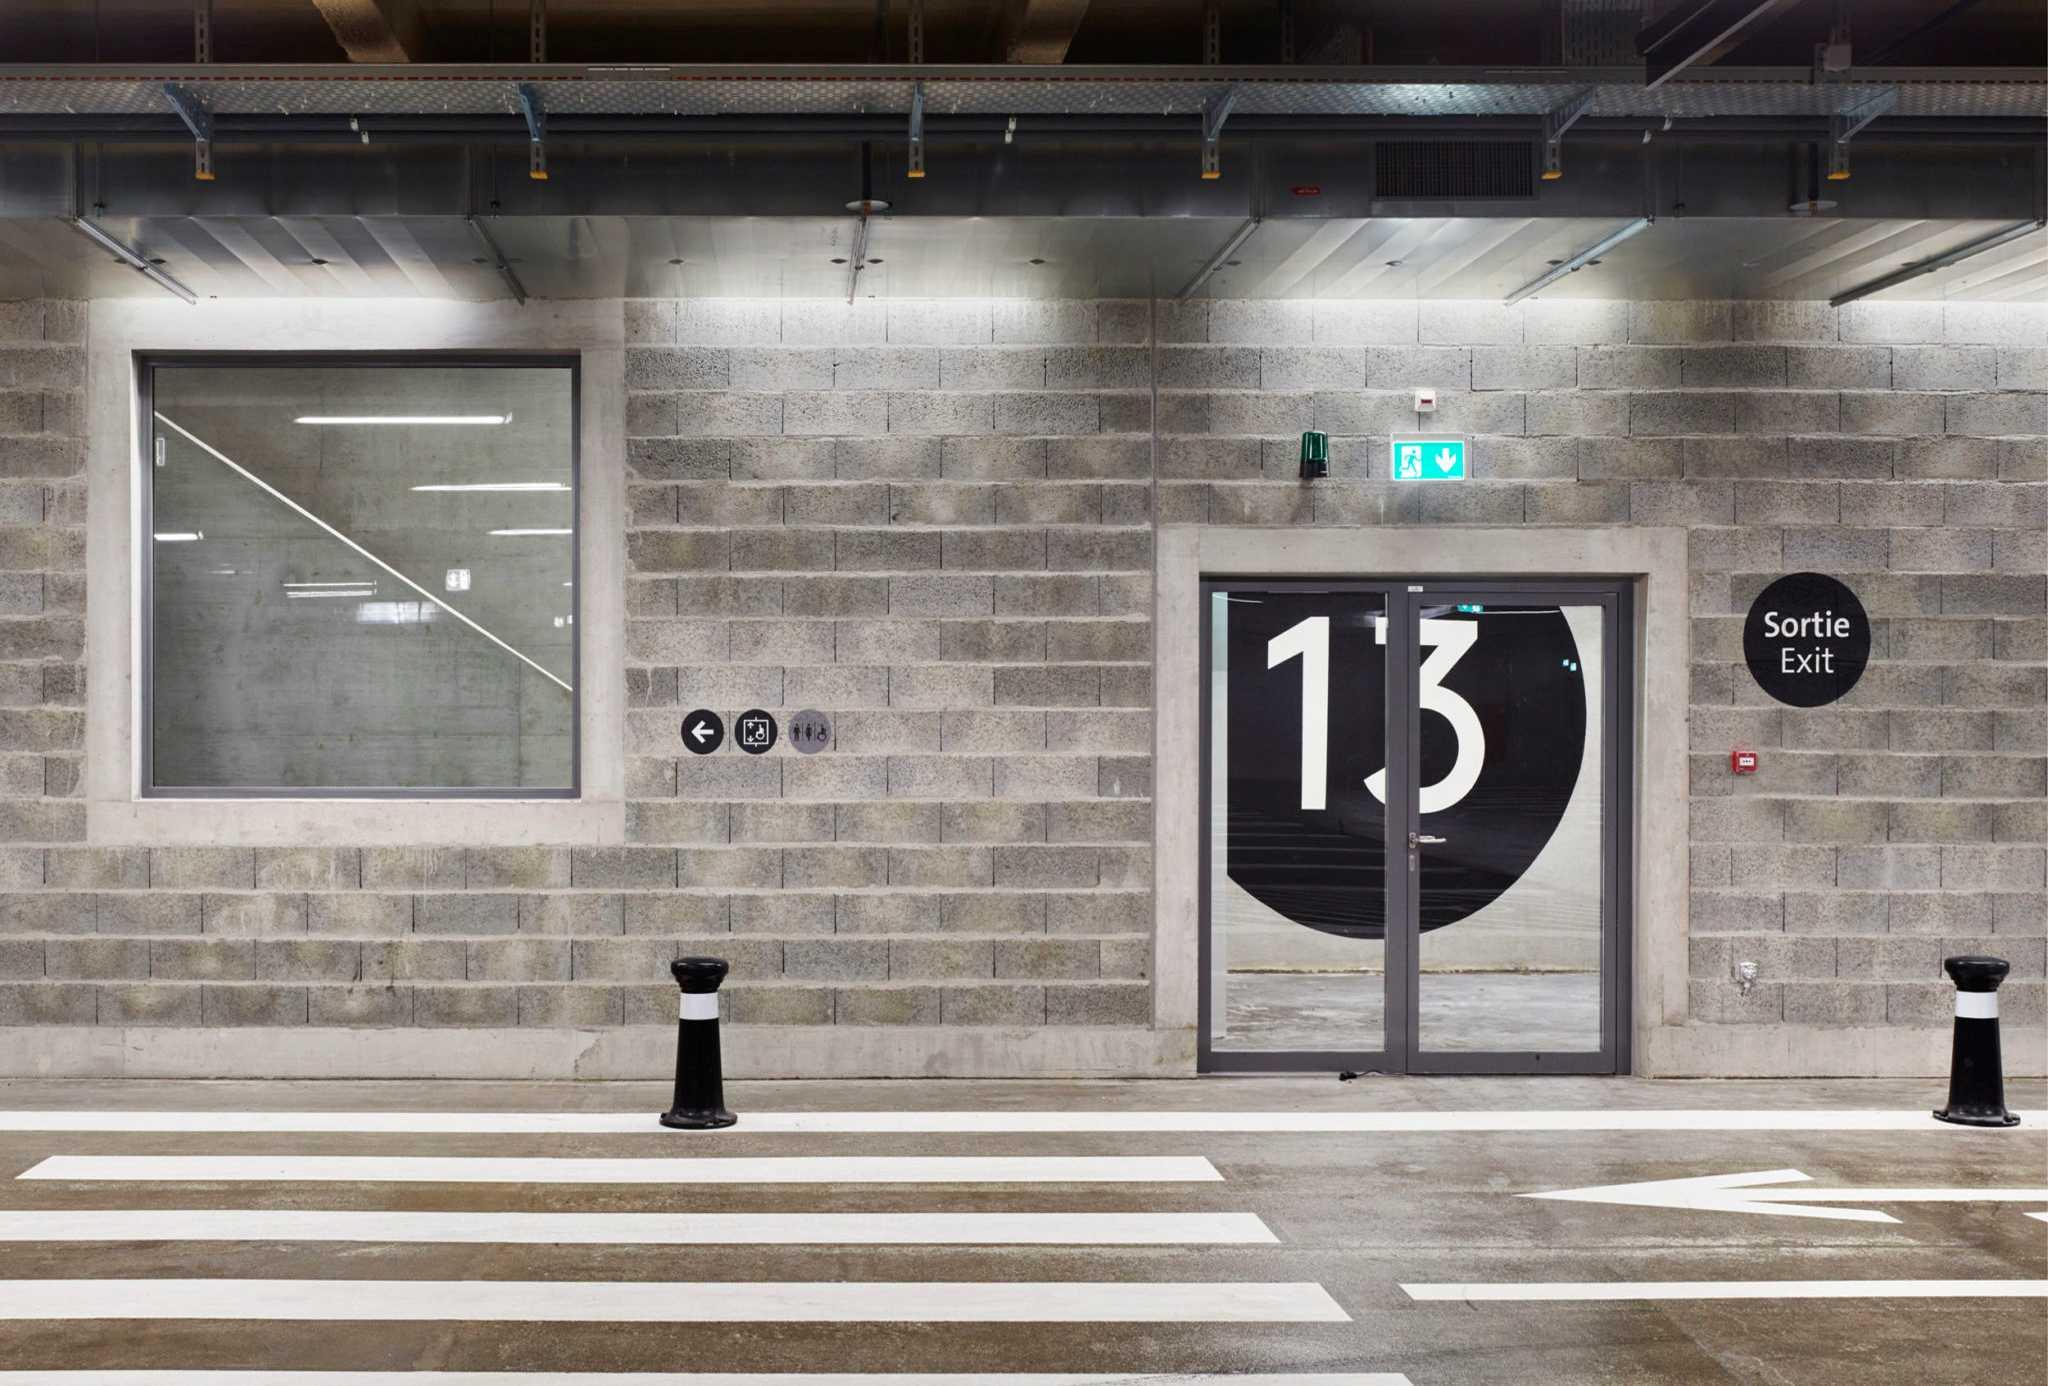 GVA parking halle 7 bunq